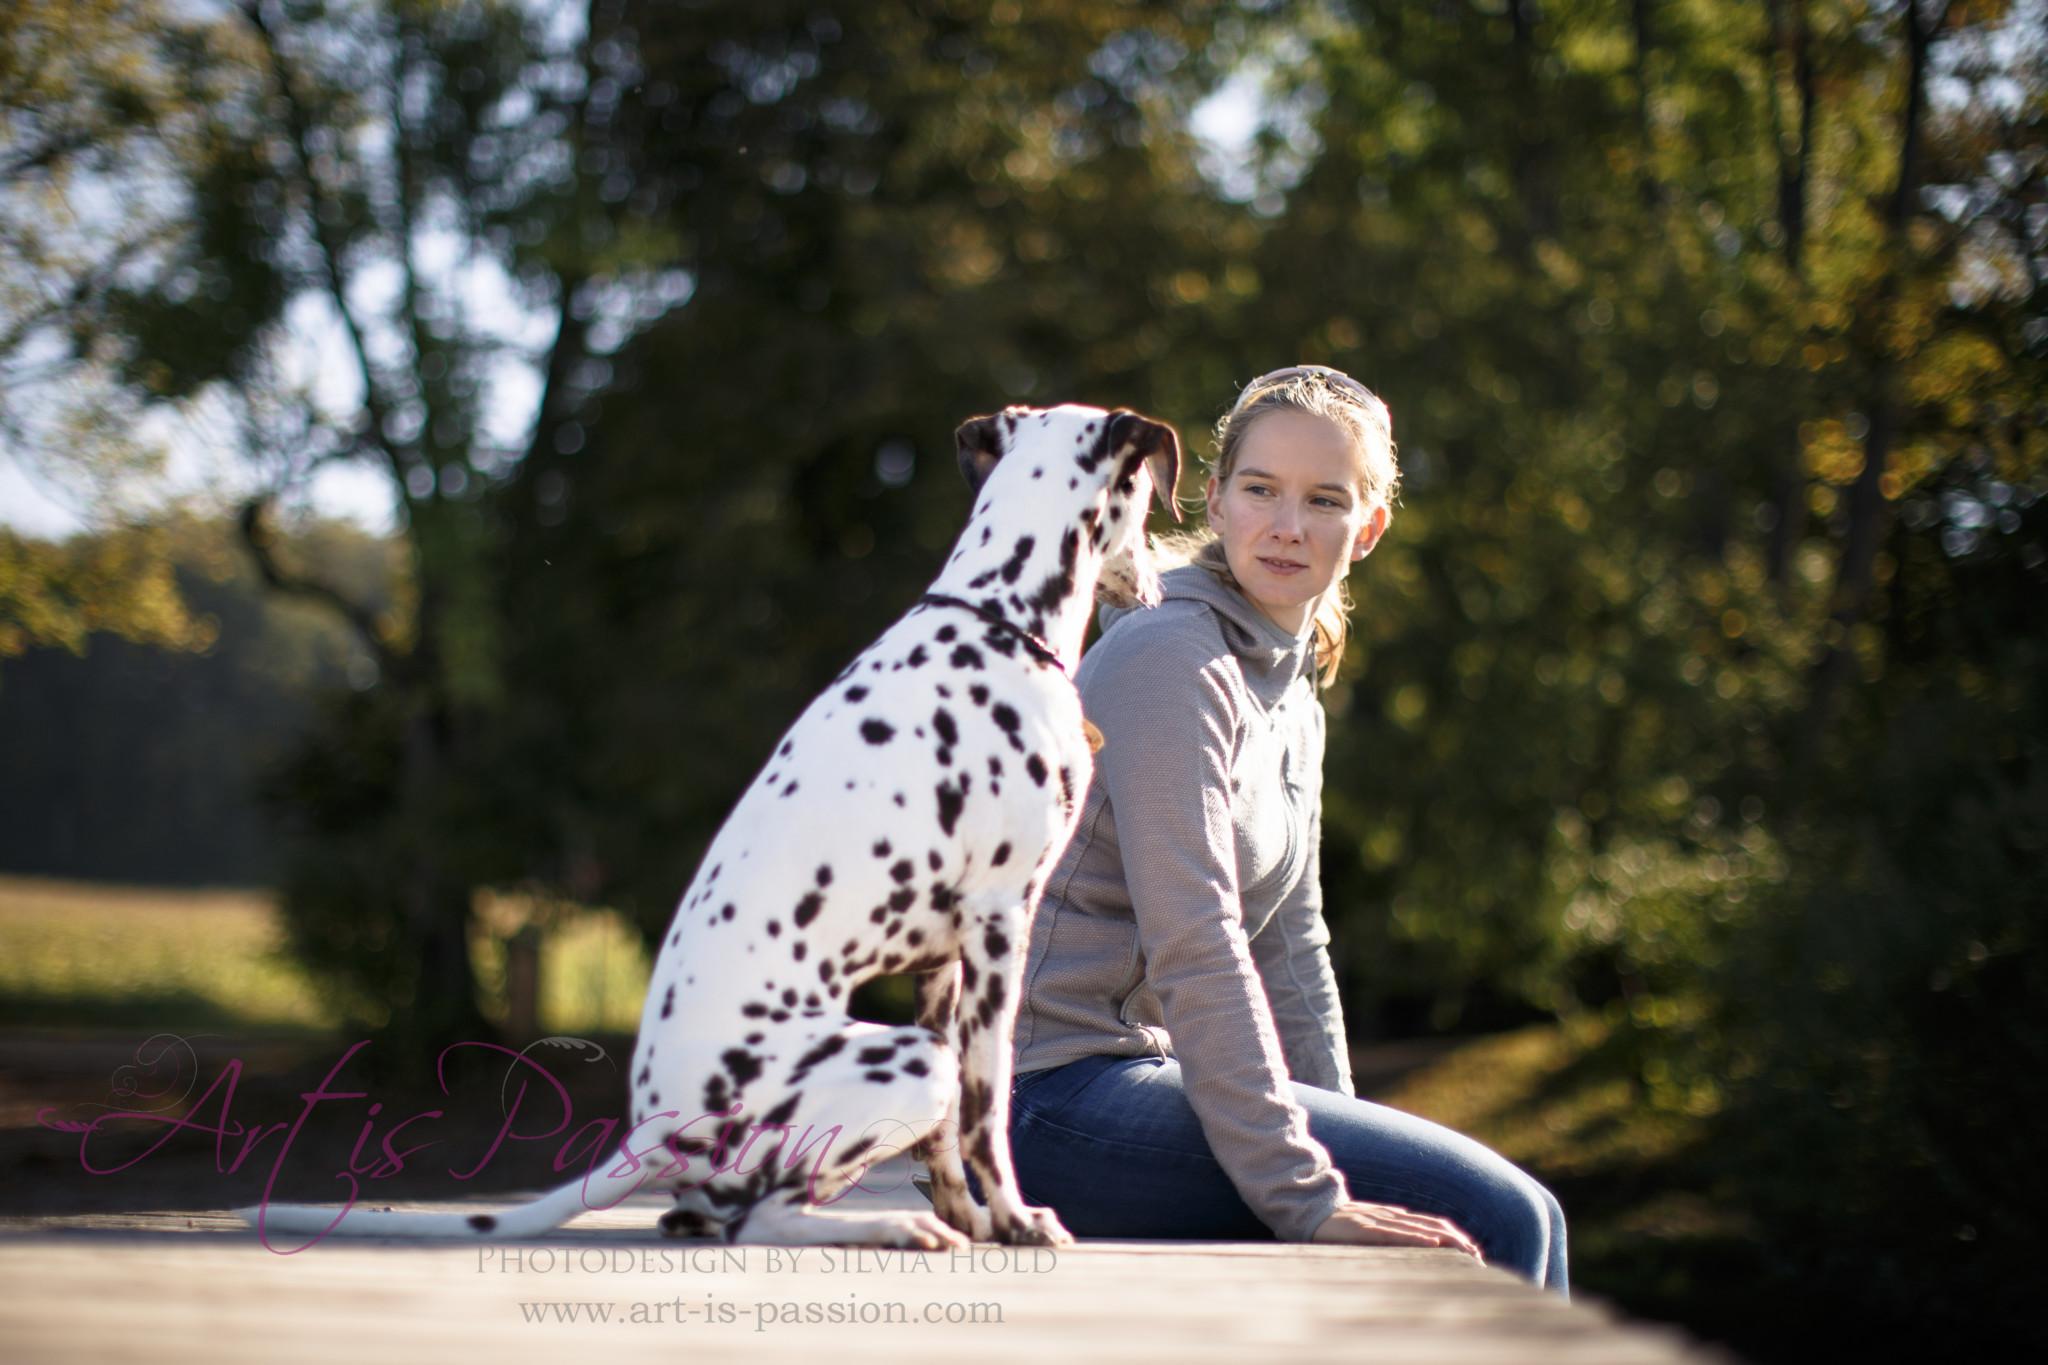 hund-signale-im-alltag